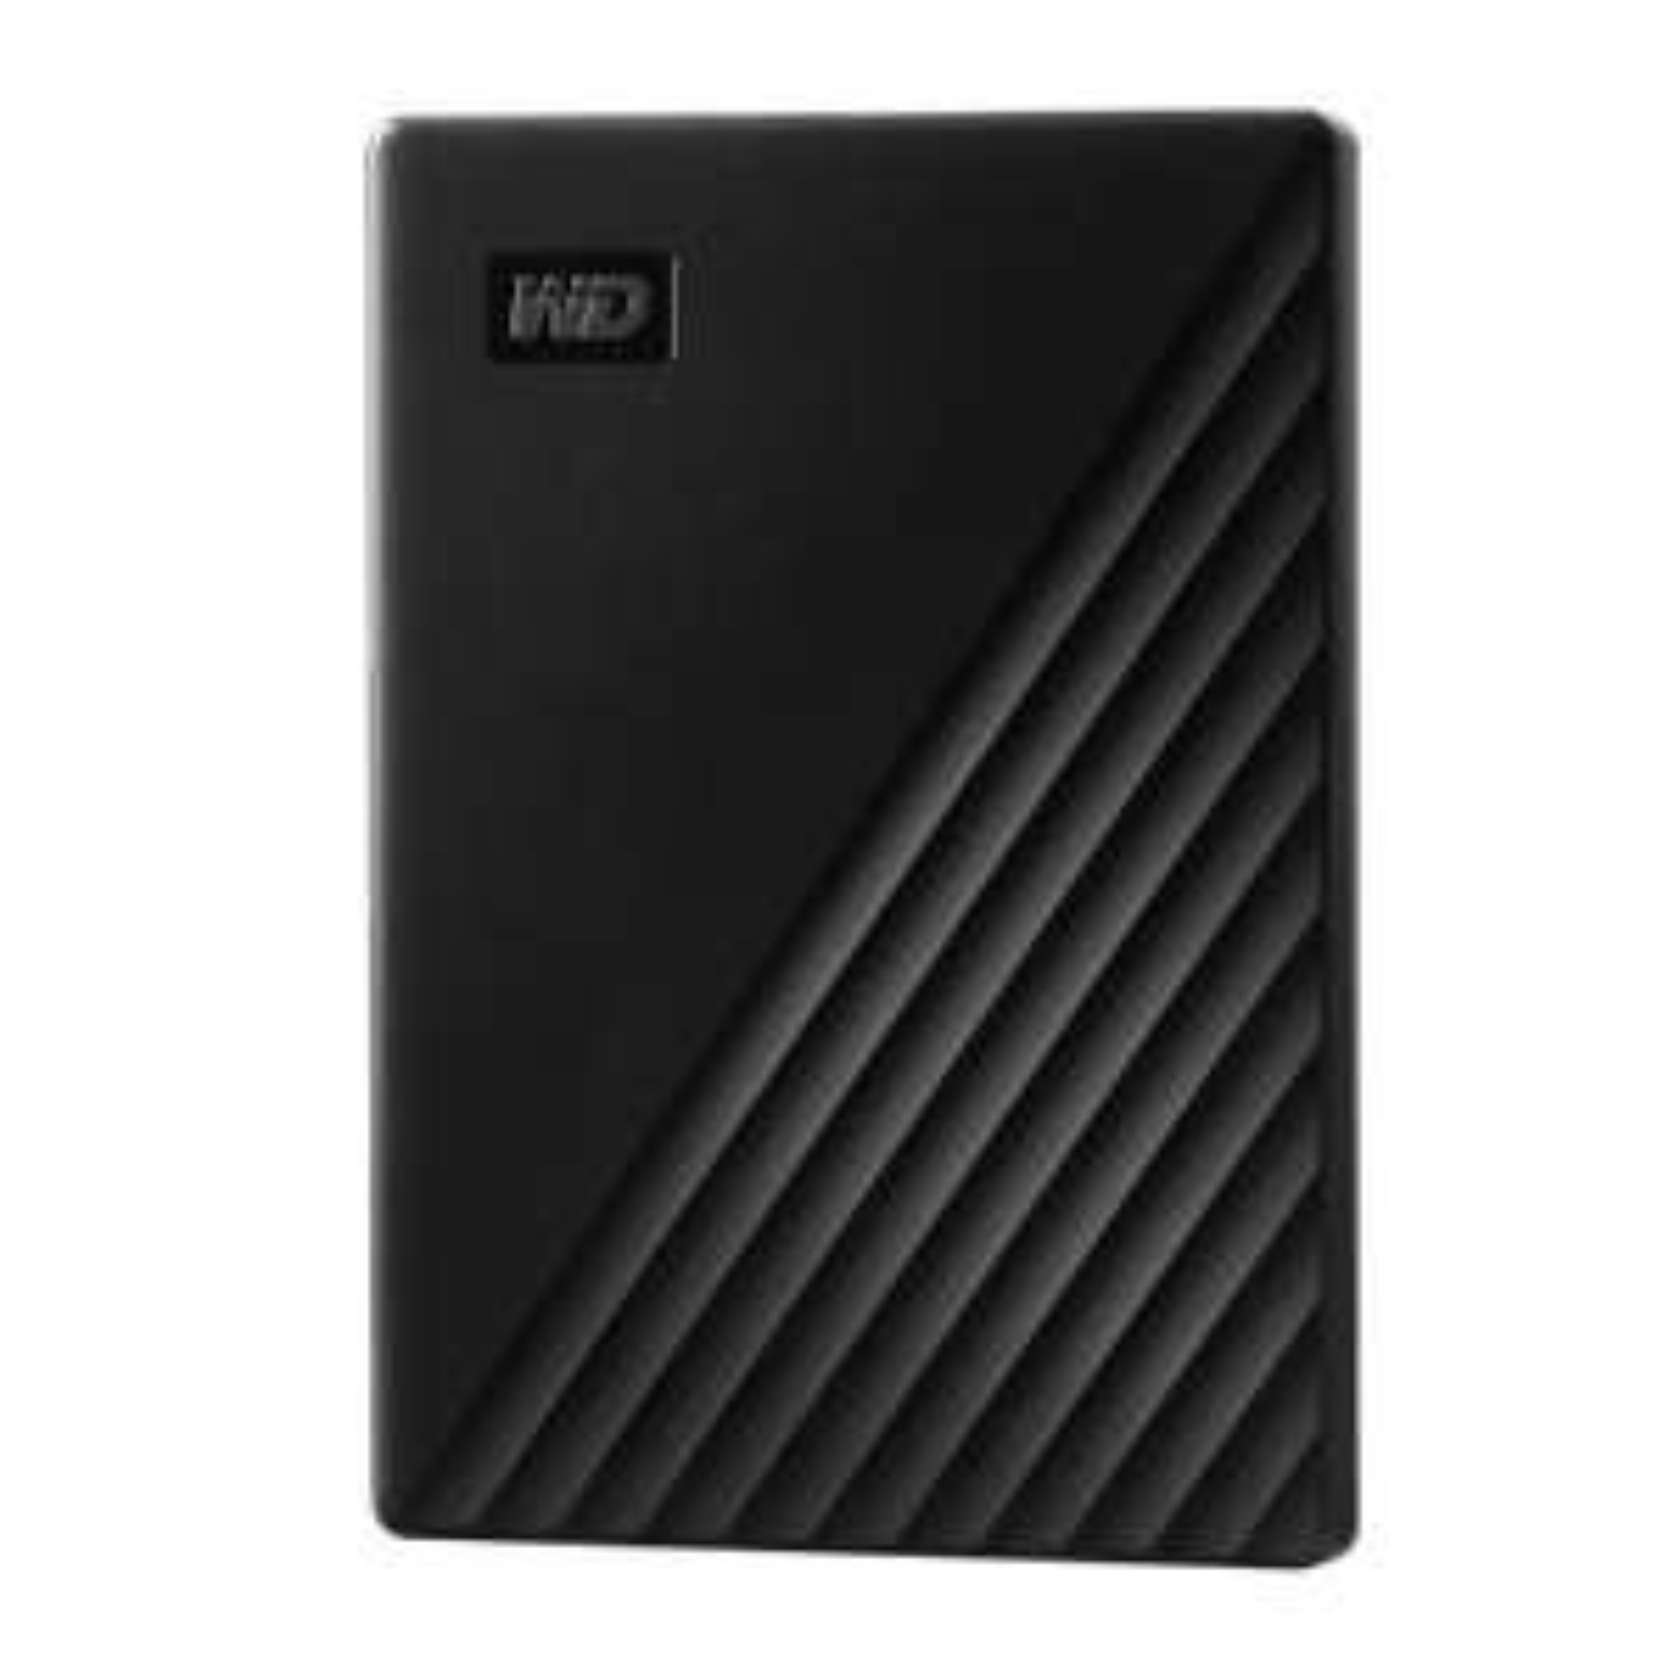 5TB usb 3 hard disk met gratis hoes